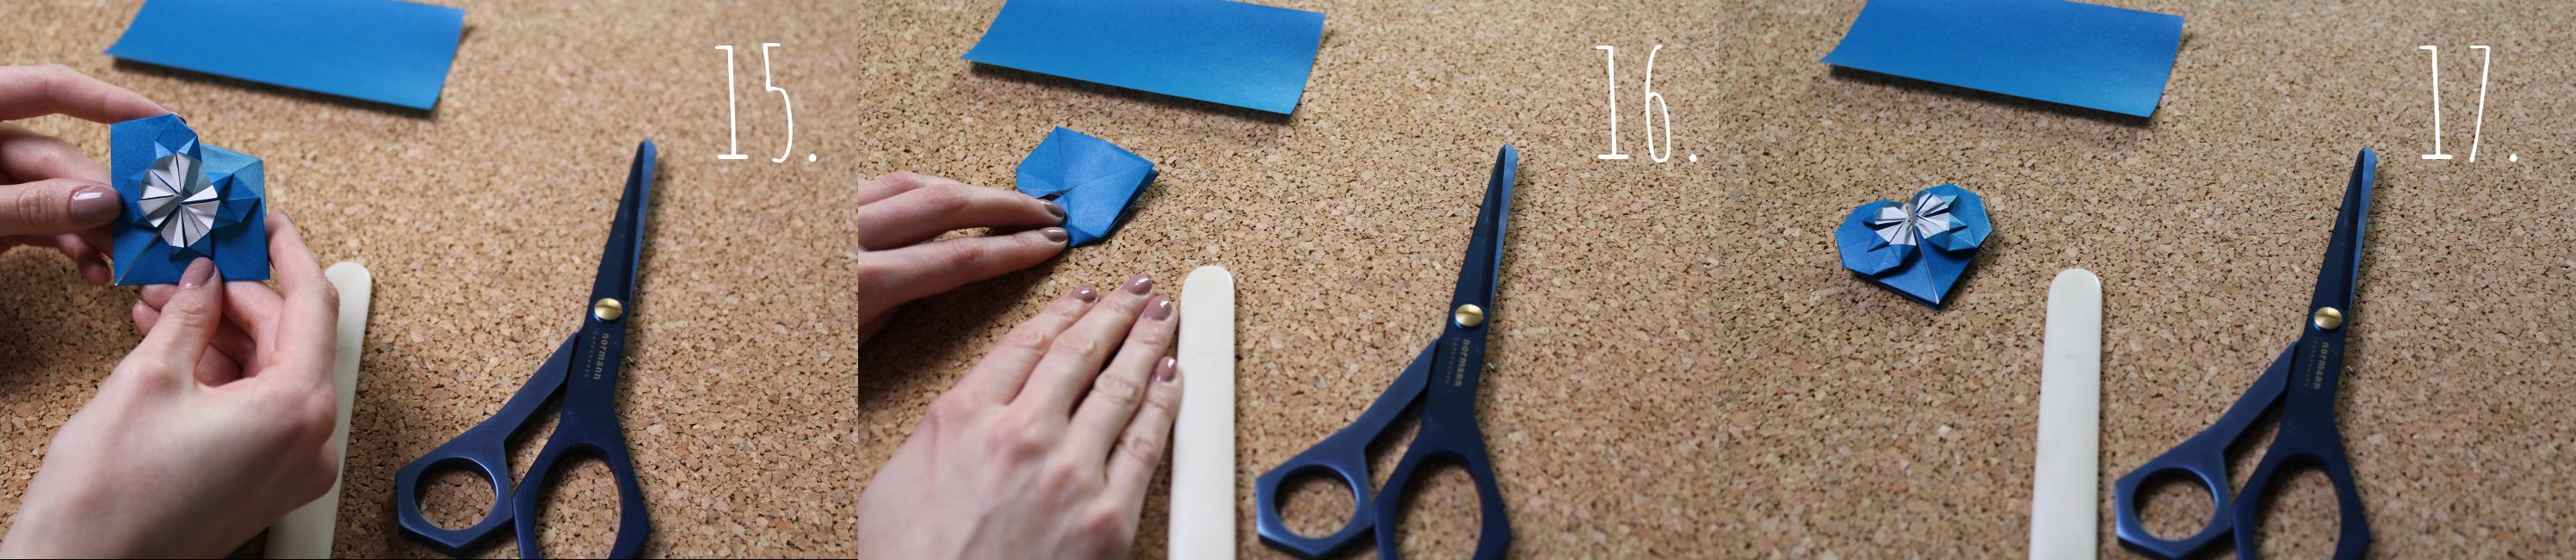 origami herz falten einfache anleitung frau friemel. Black Bedroom Furniture Sets. Home Design Ideas